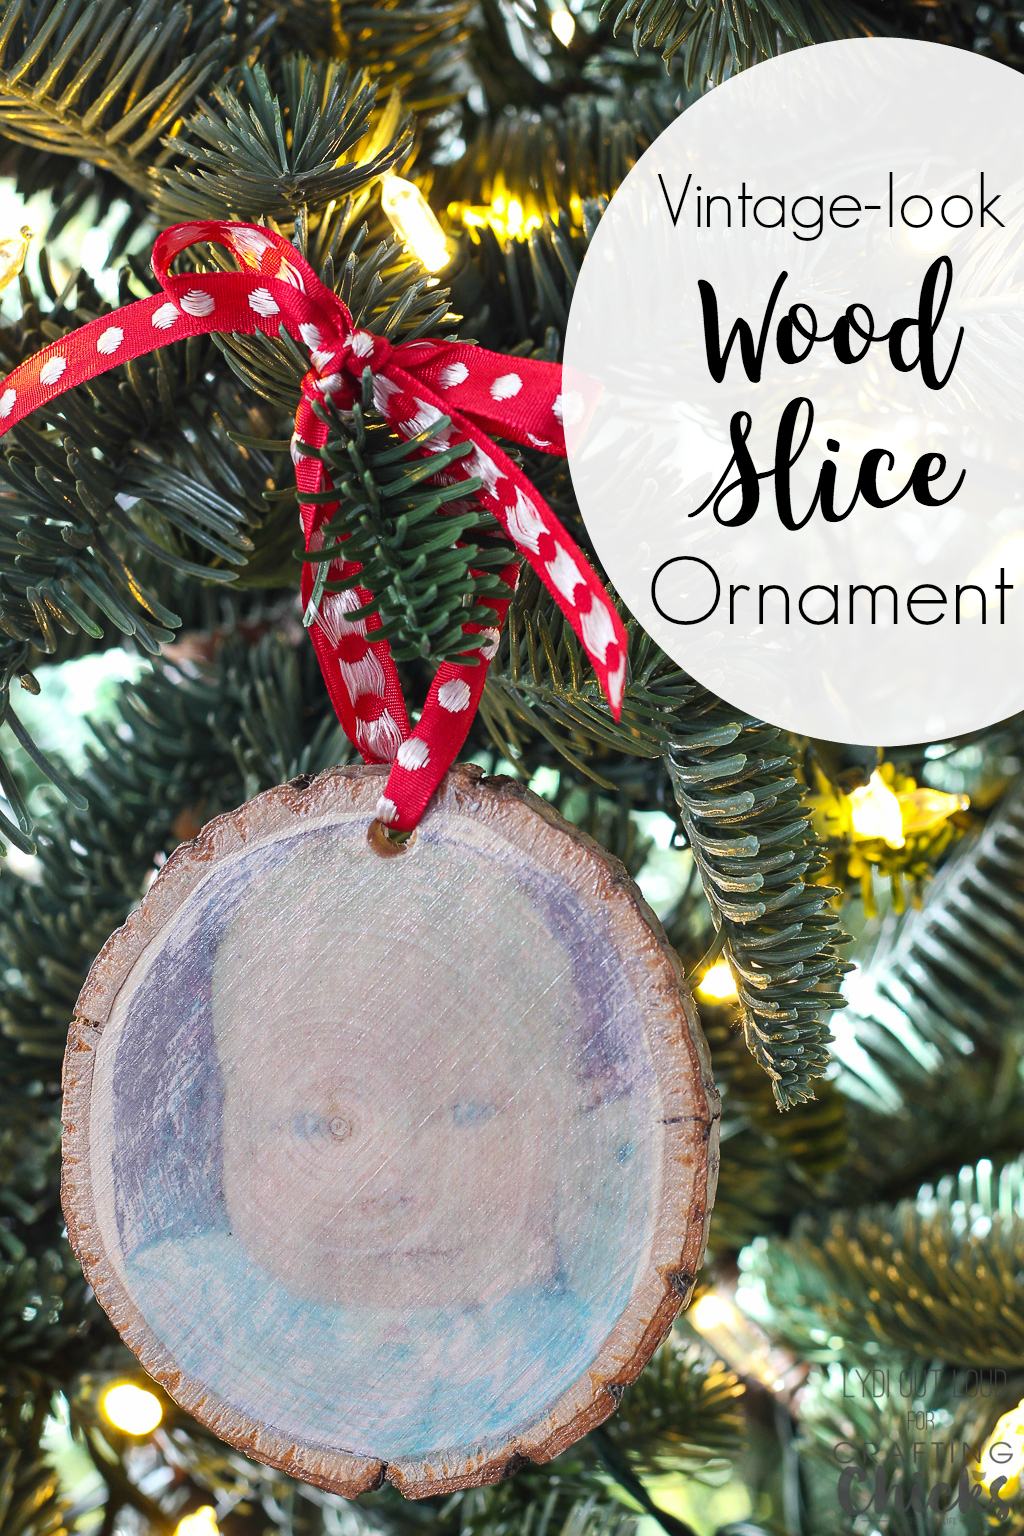 DIY Vintage-look Photo Transfer Wood Slice Christmas Ornament #diyornament #woodslicecrafts #babysfirstchristmas